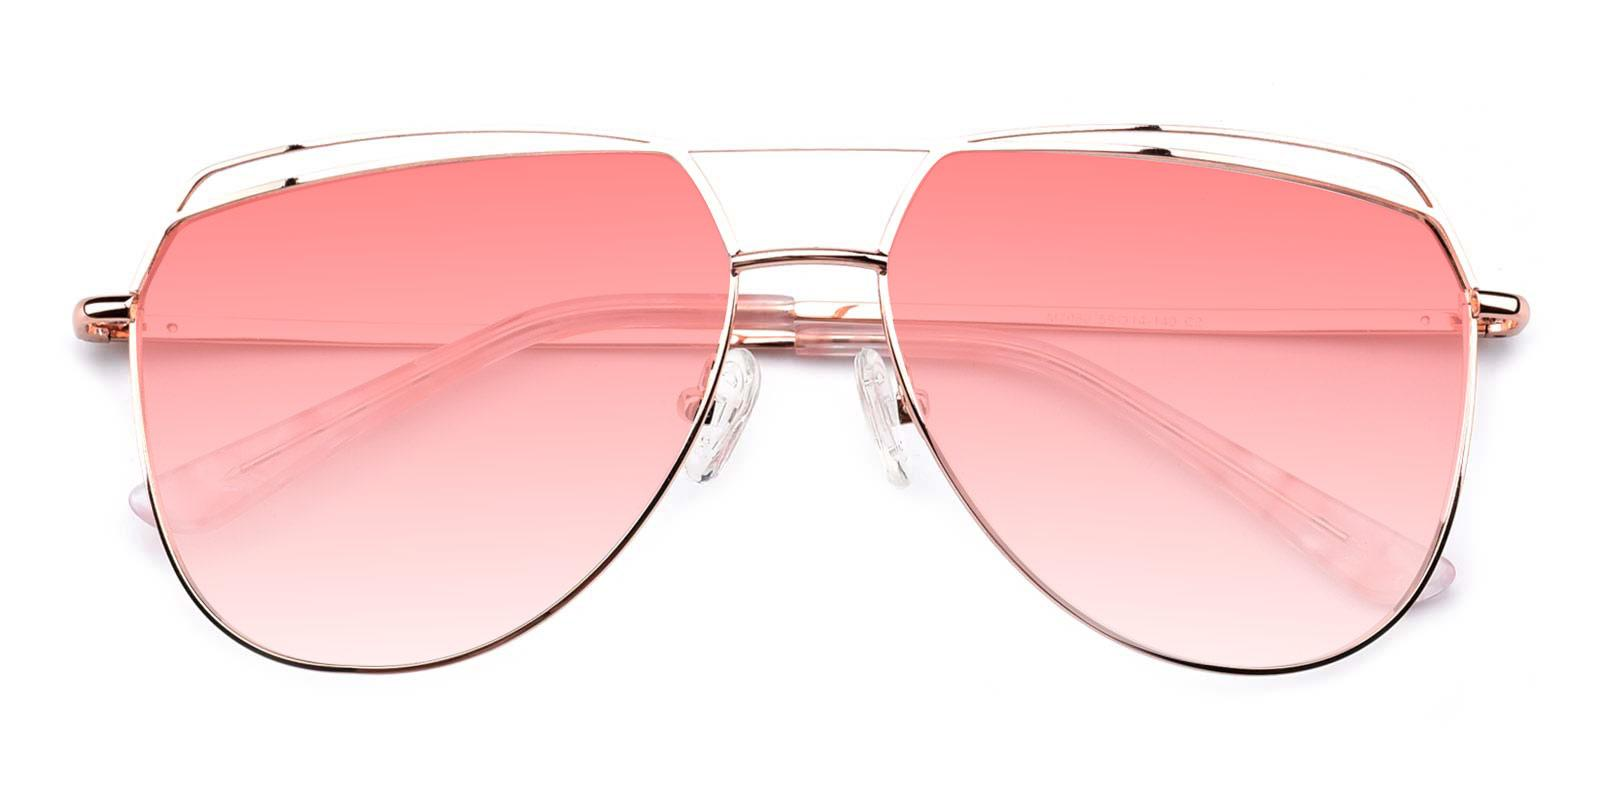 Acto-Pink-Aviator-Metal-Sunglasses-detail